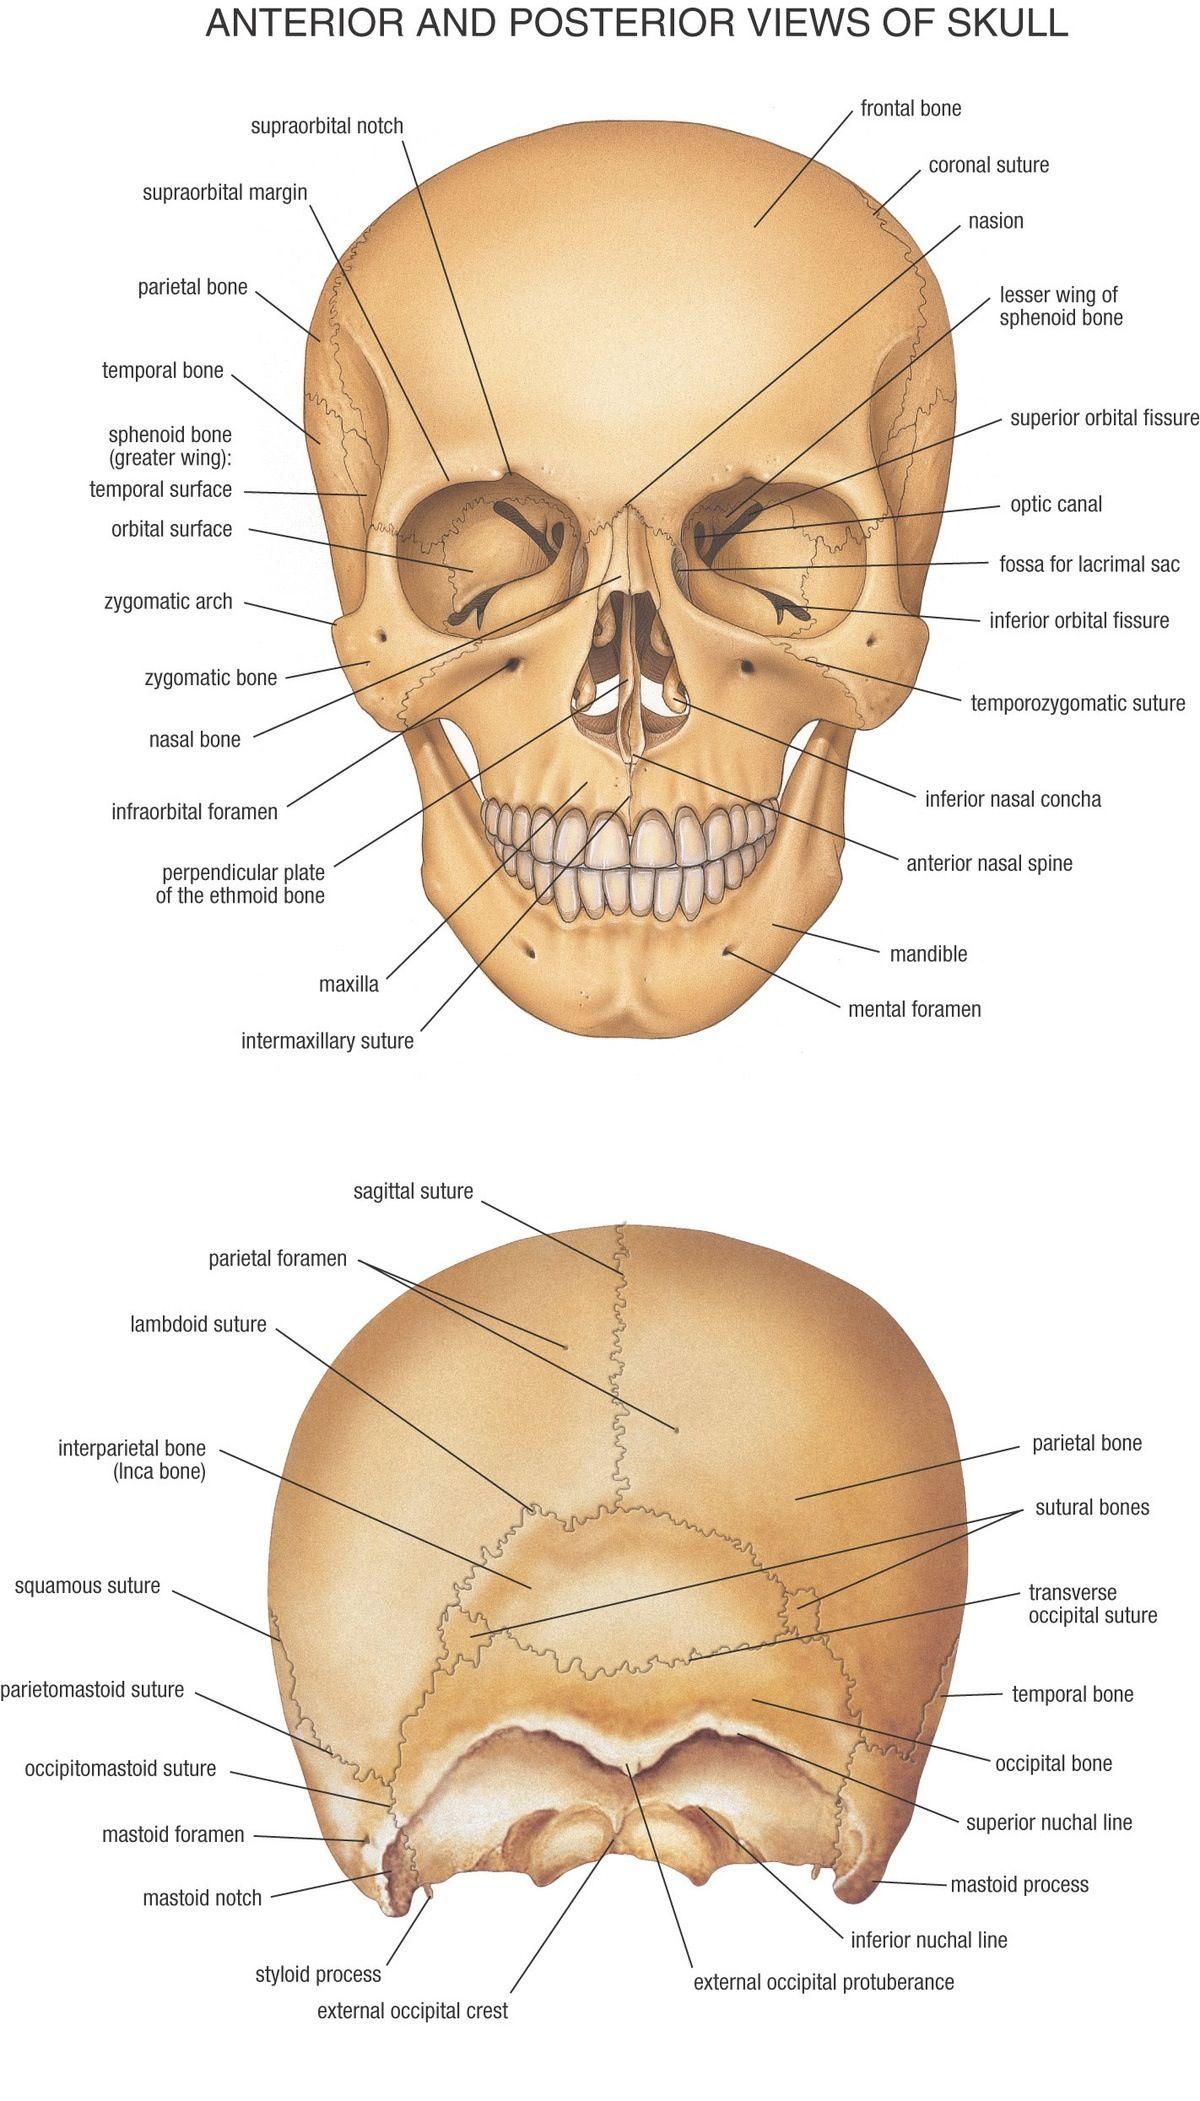 Anterior And Posterior View Of Skull Skulls Pinterest Anatomy